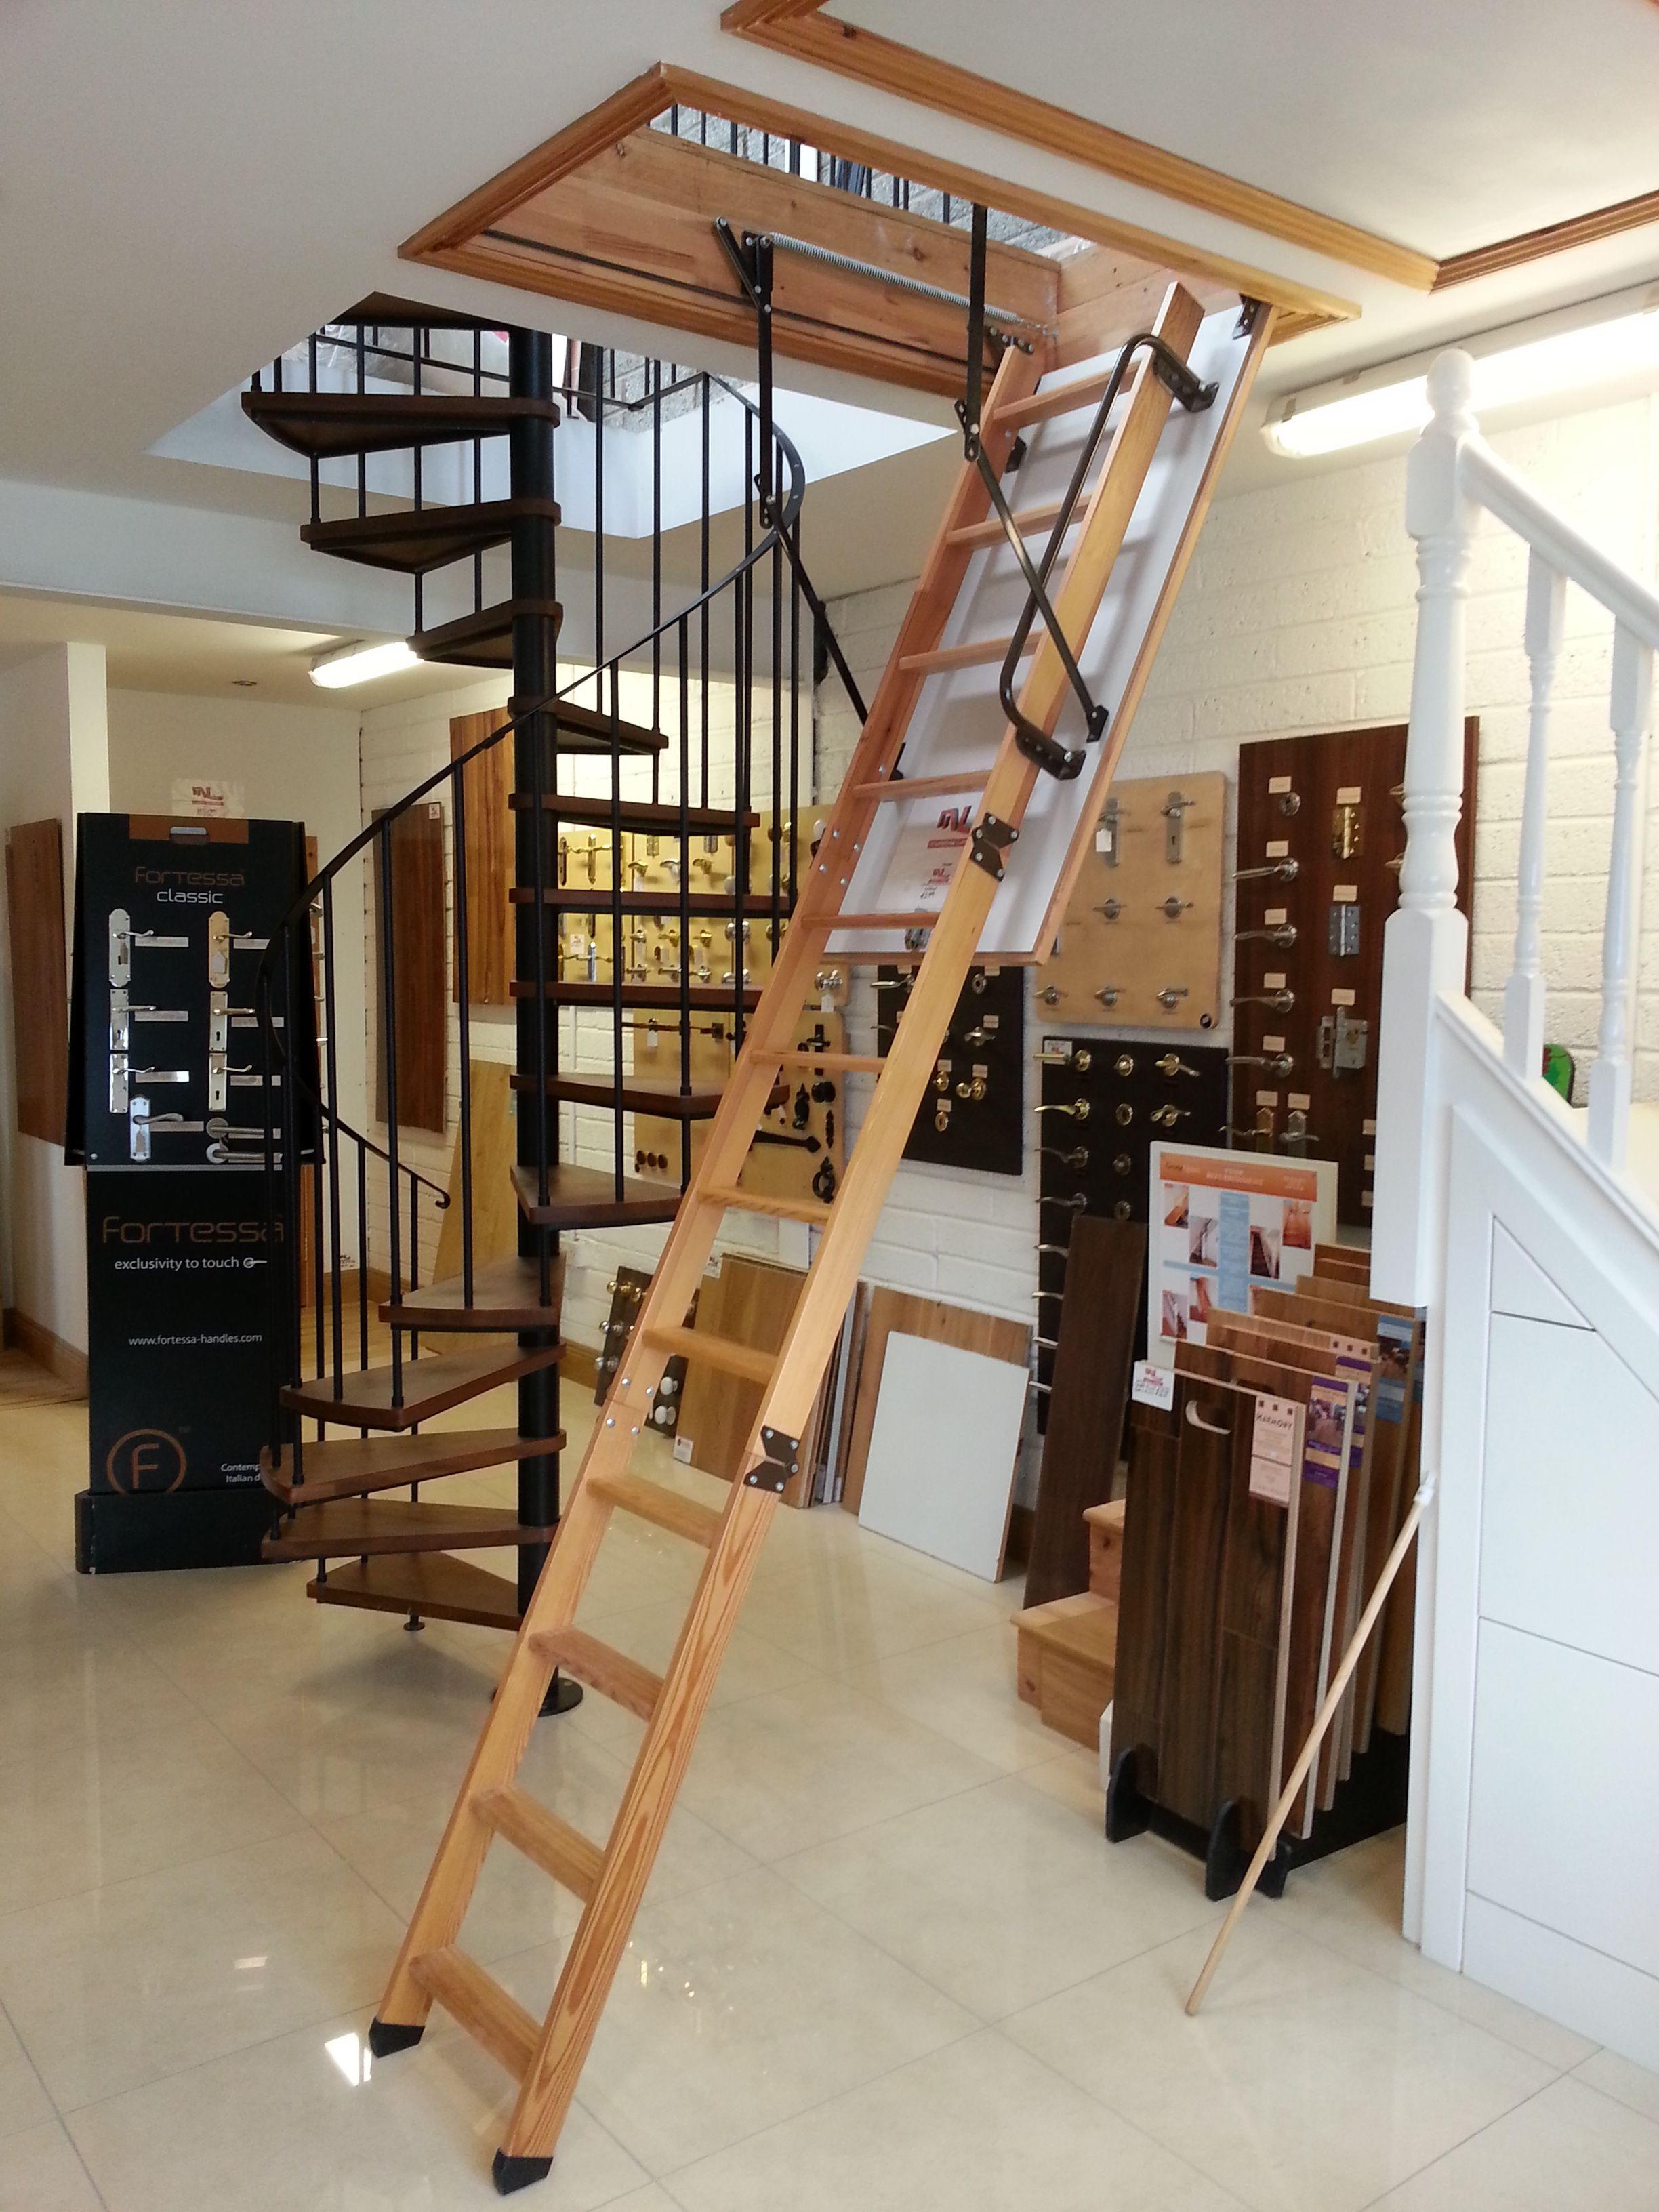 Minka loft ladder shark hoover twin battery